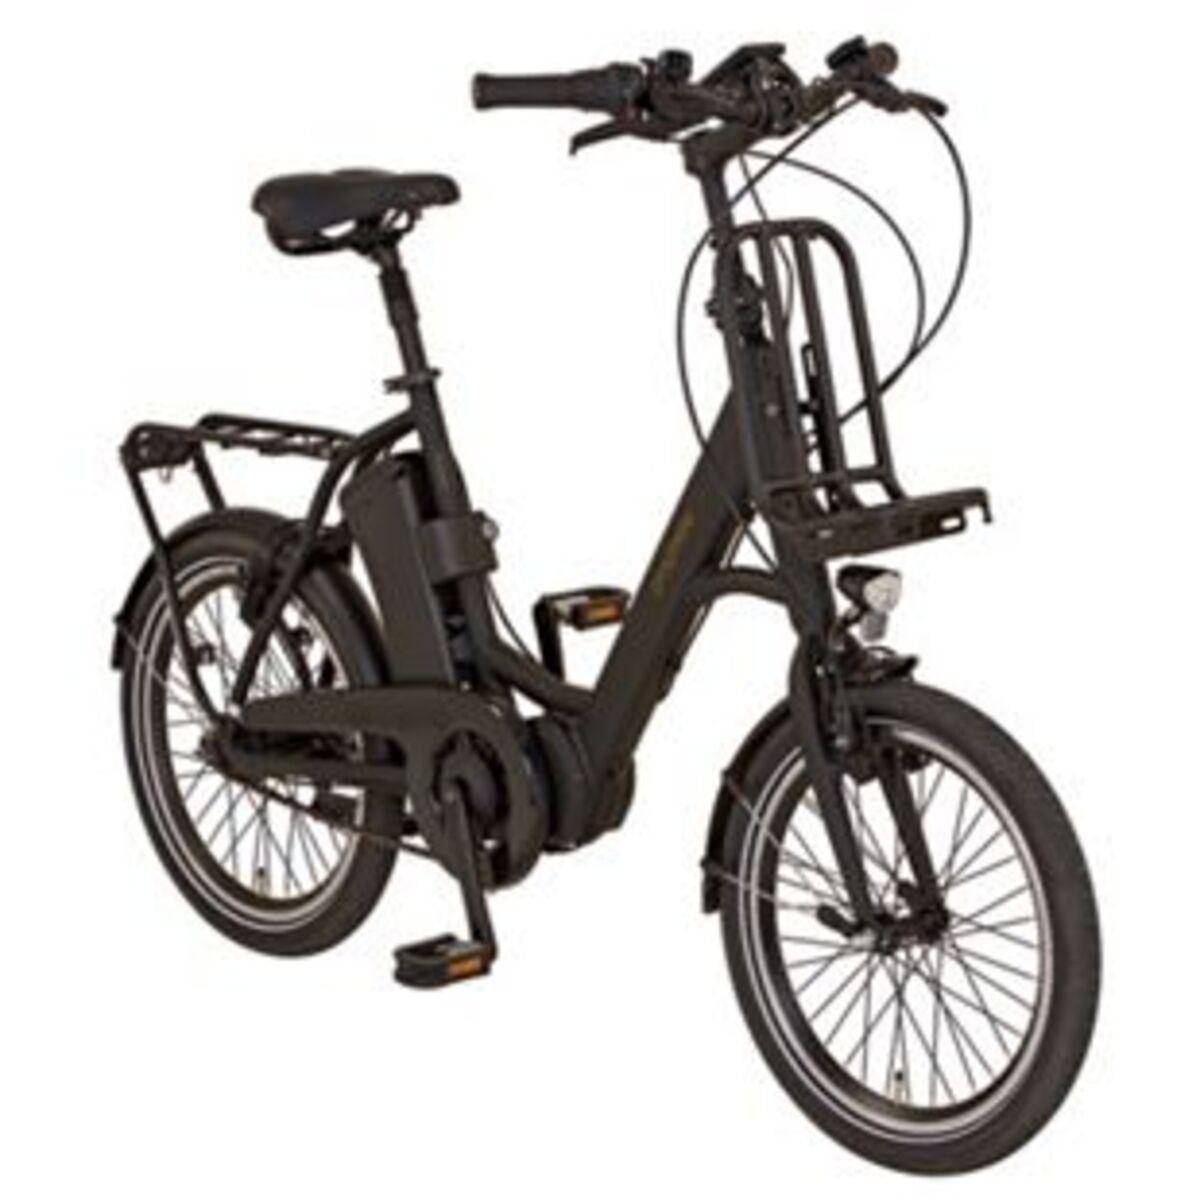 "Bild 2 von PROPHETE URBANICER 20.ETU.10 20"" Urban E-Bike"